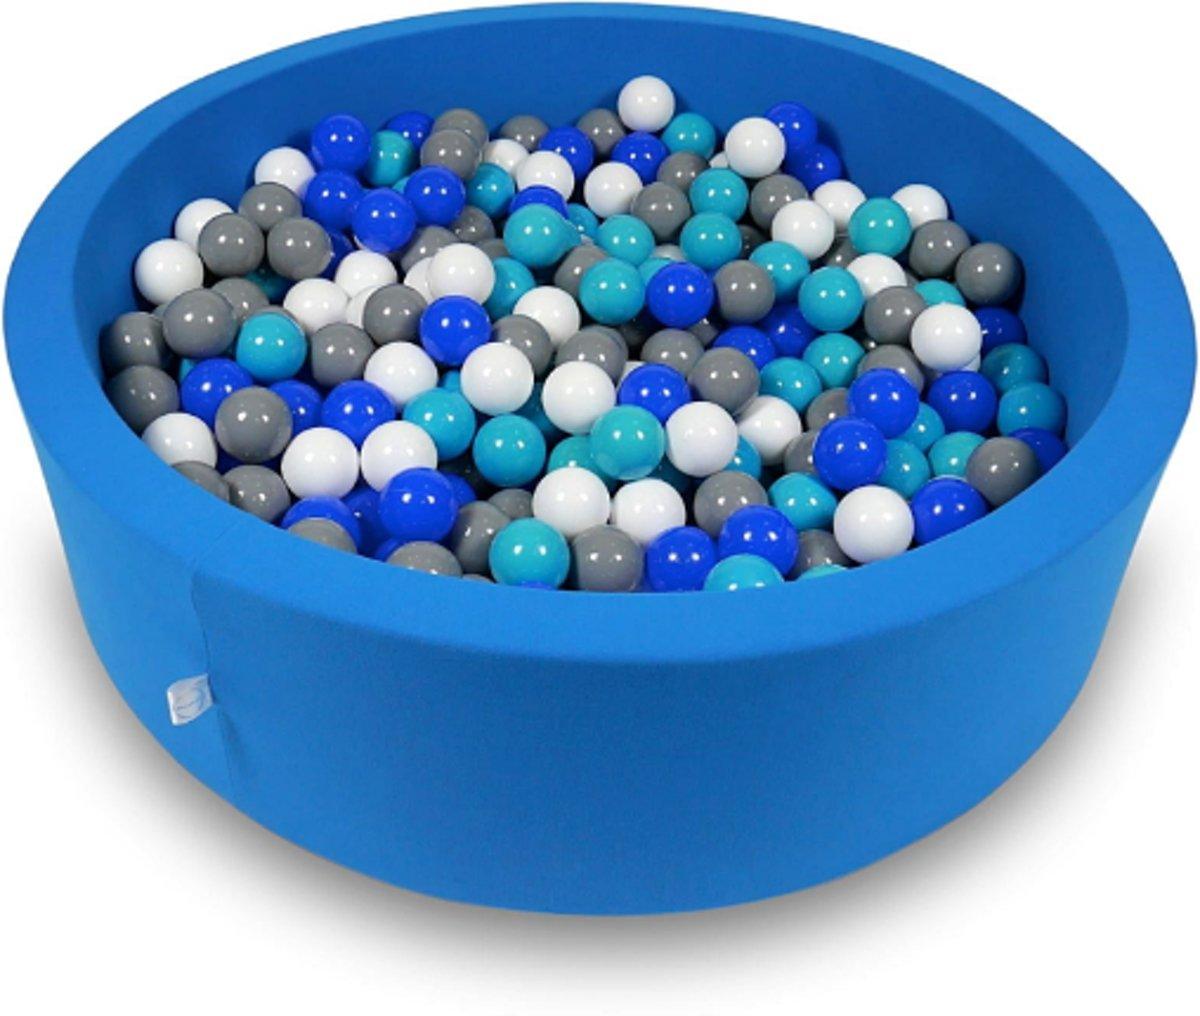 Ballenbak - 400 ballen - 115 x 30 cm - ballenbad - rond blauw